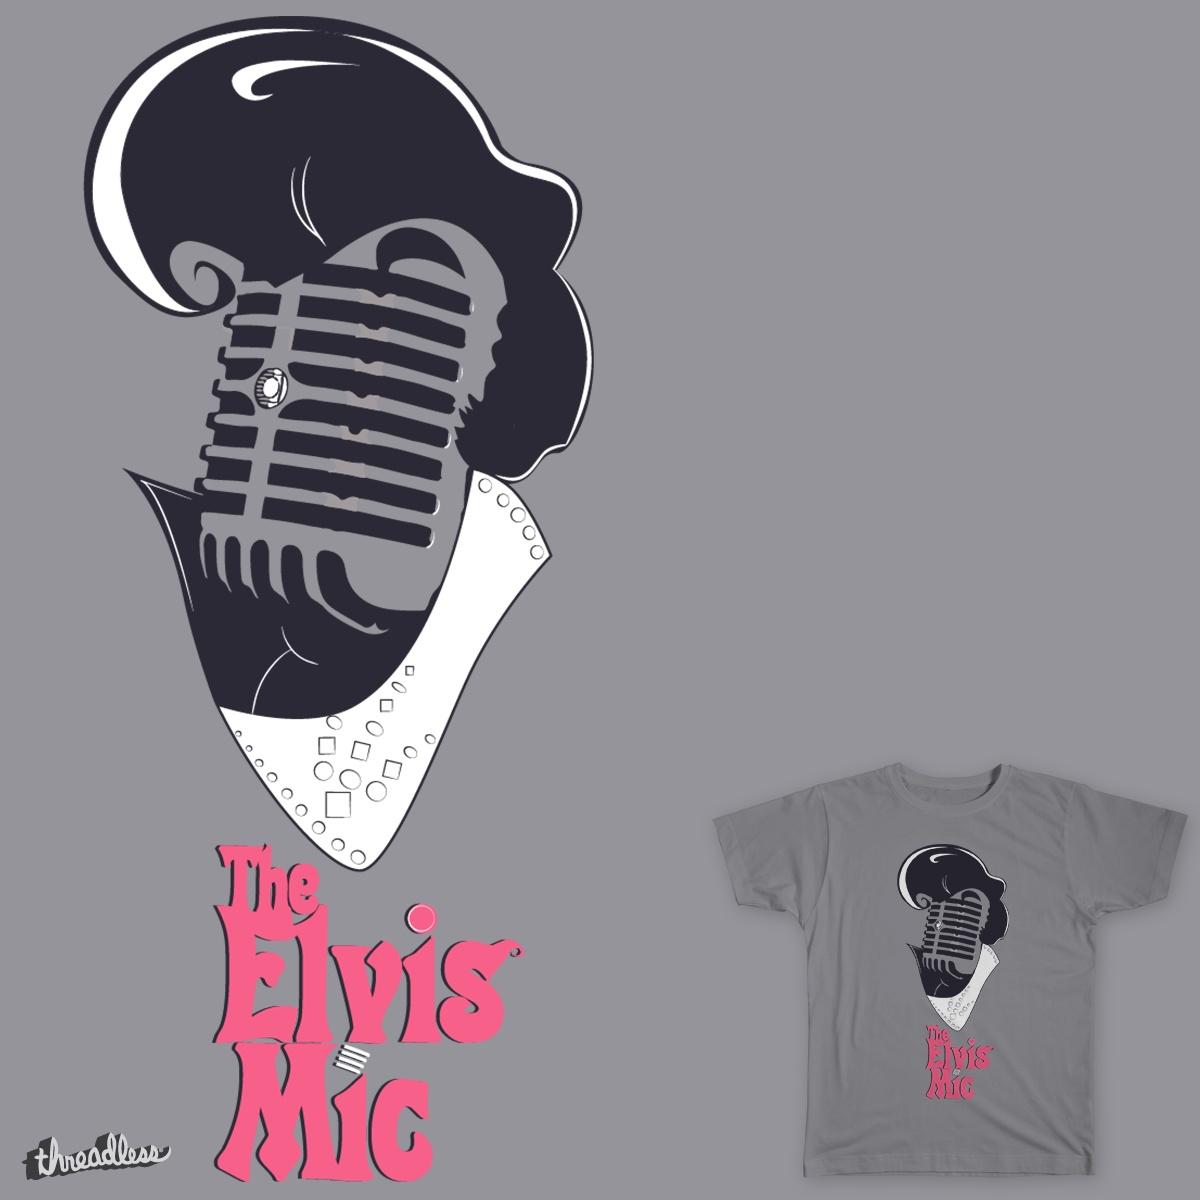 The Elvis Mic by EdiLOp80s on Threadless